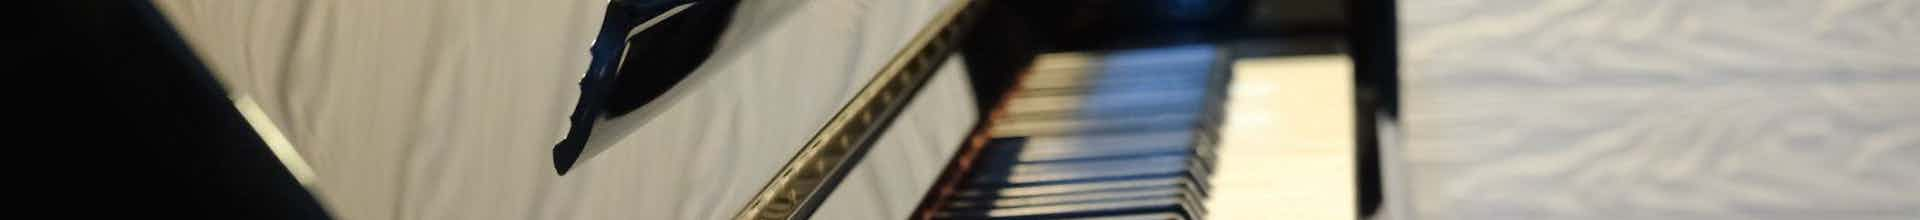 instrument-piano